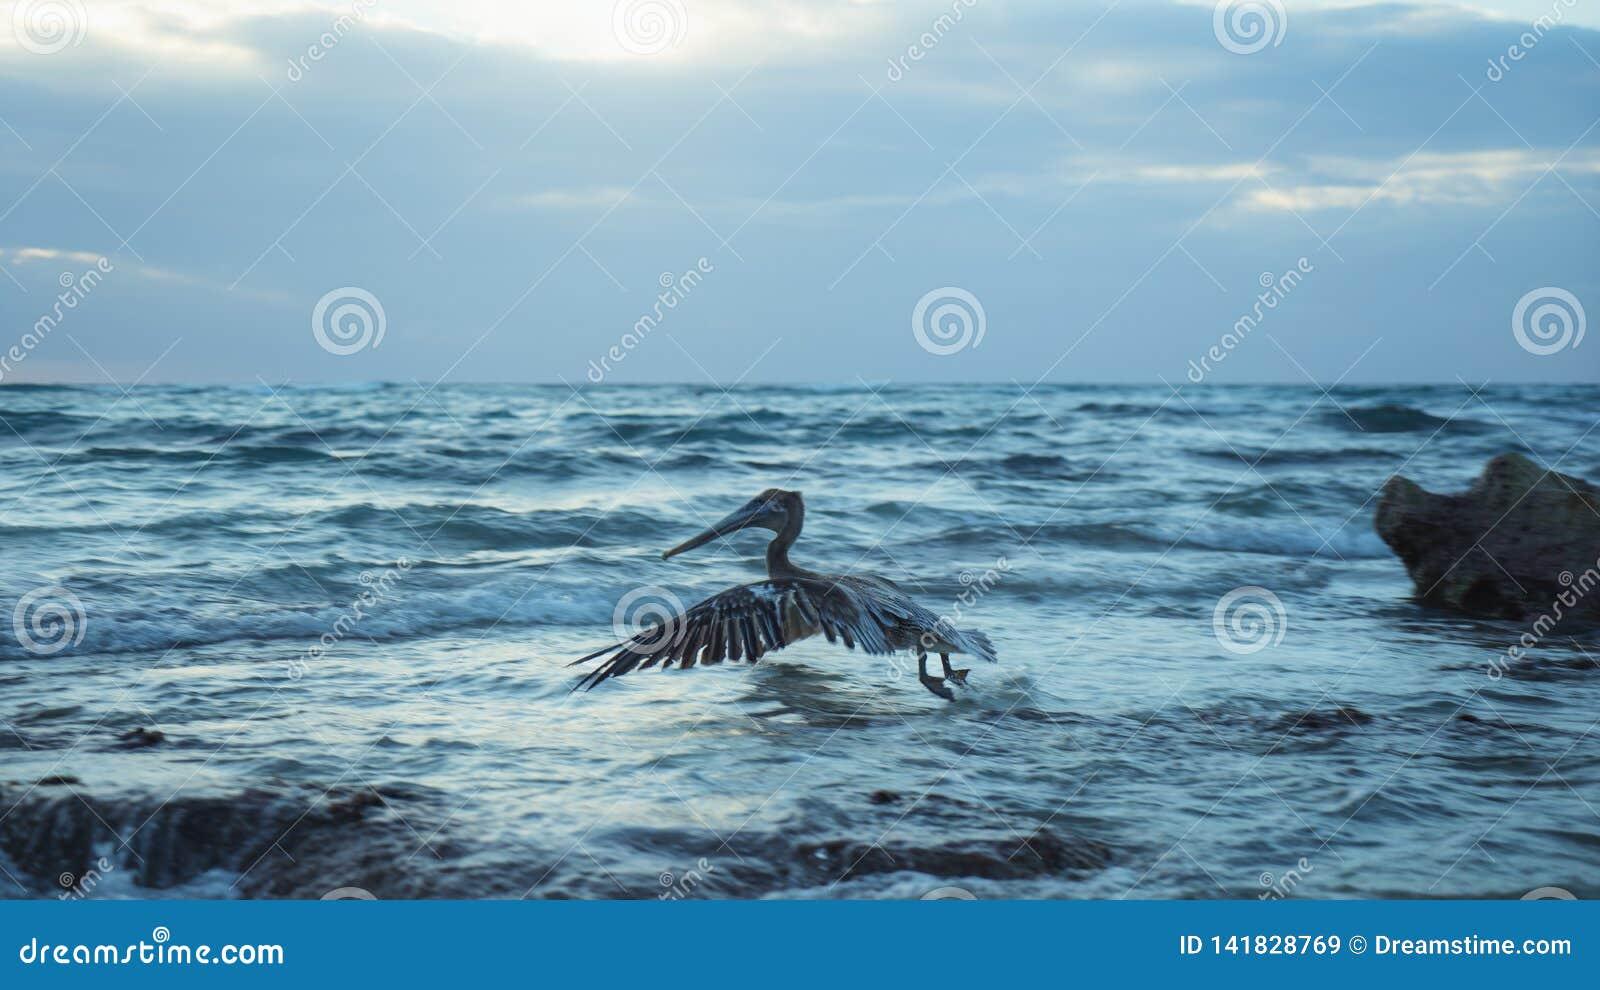 Pelican Bird Flying Mexico Sea Ocean Sunrise